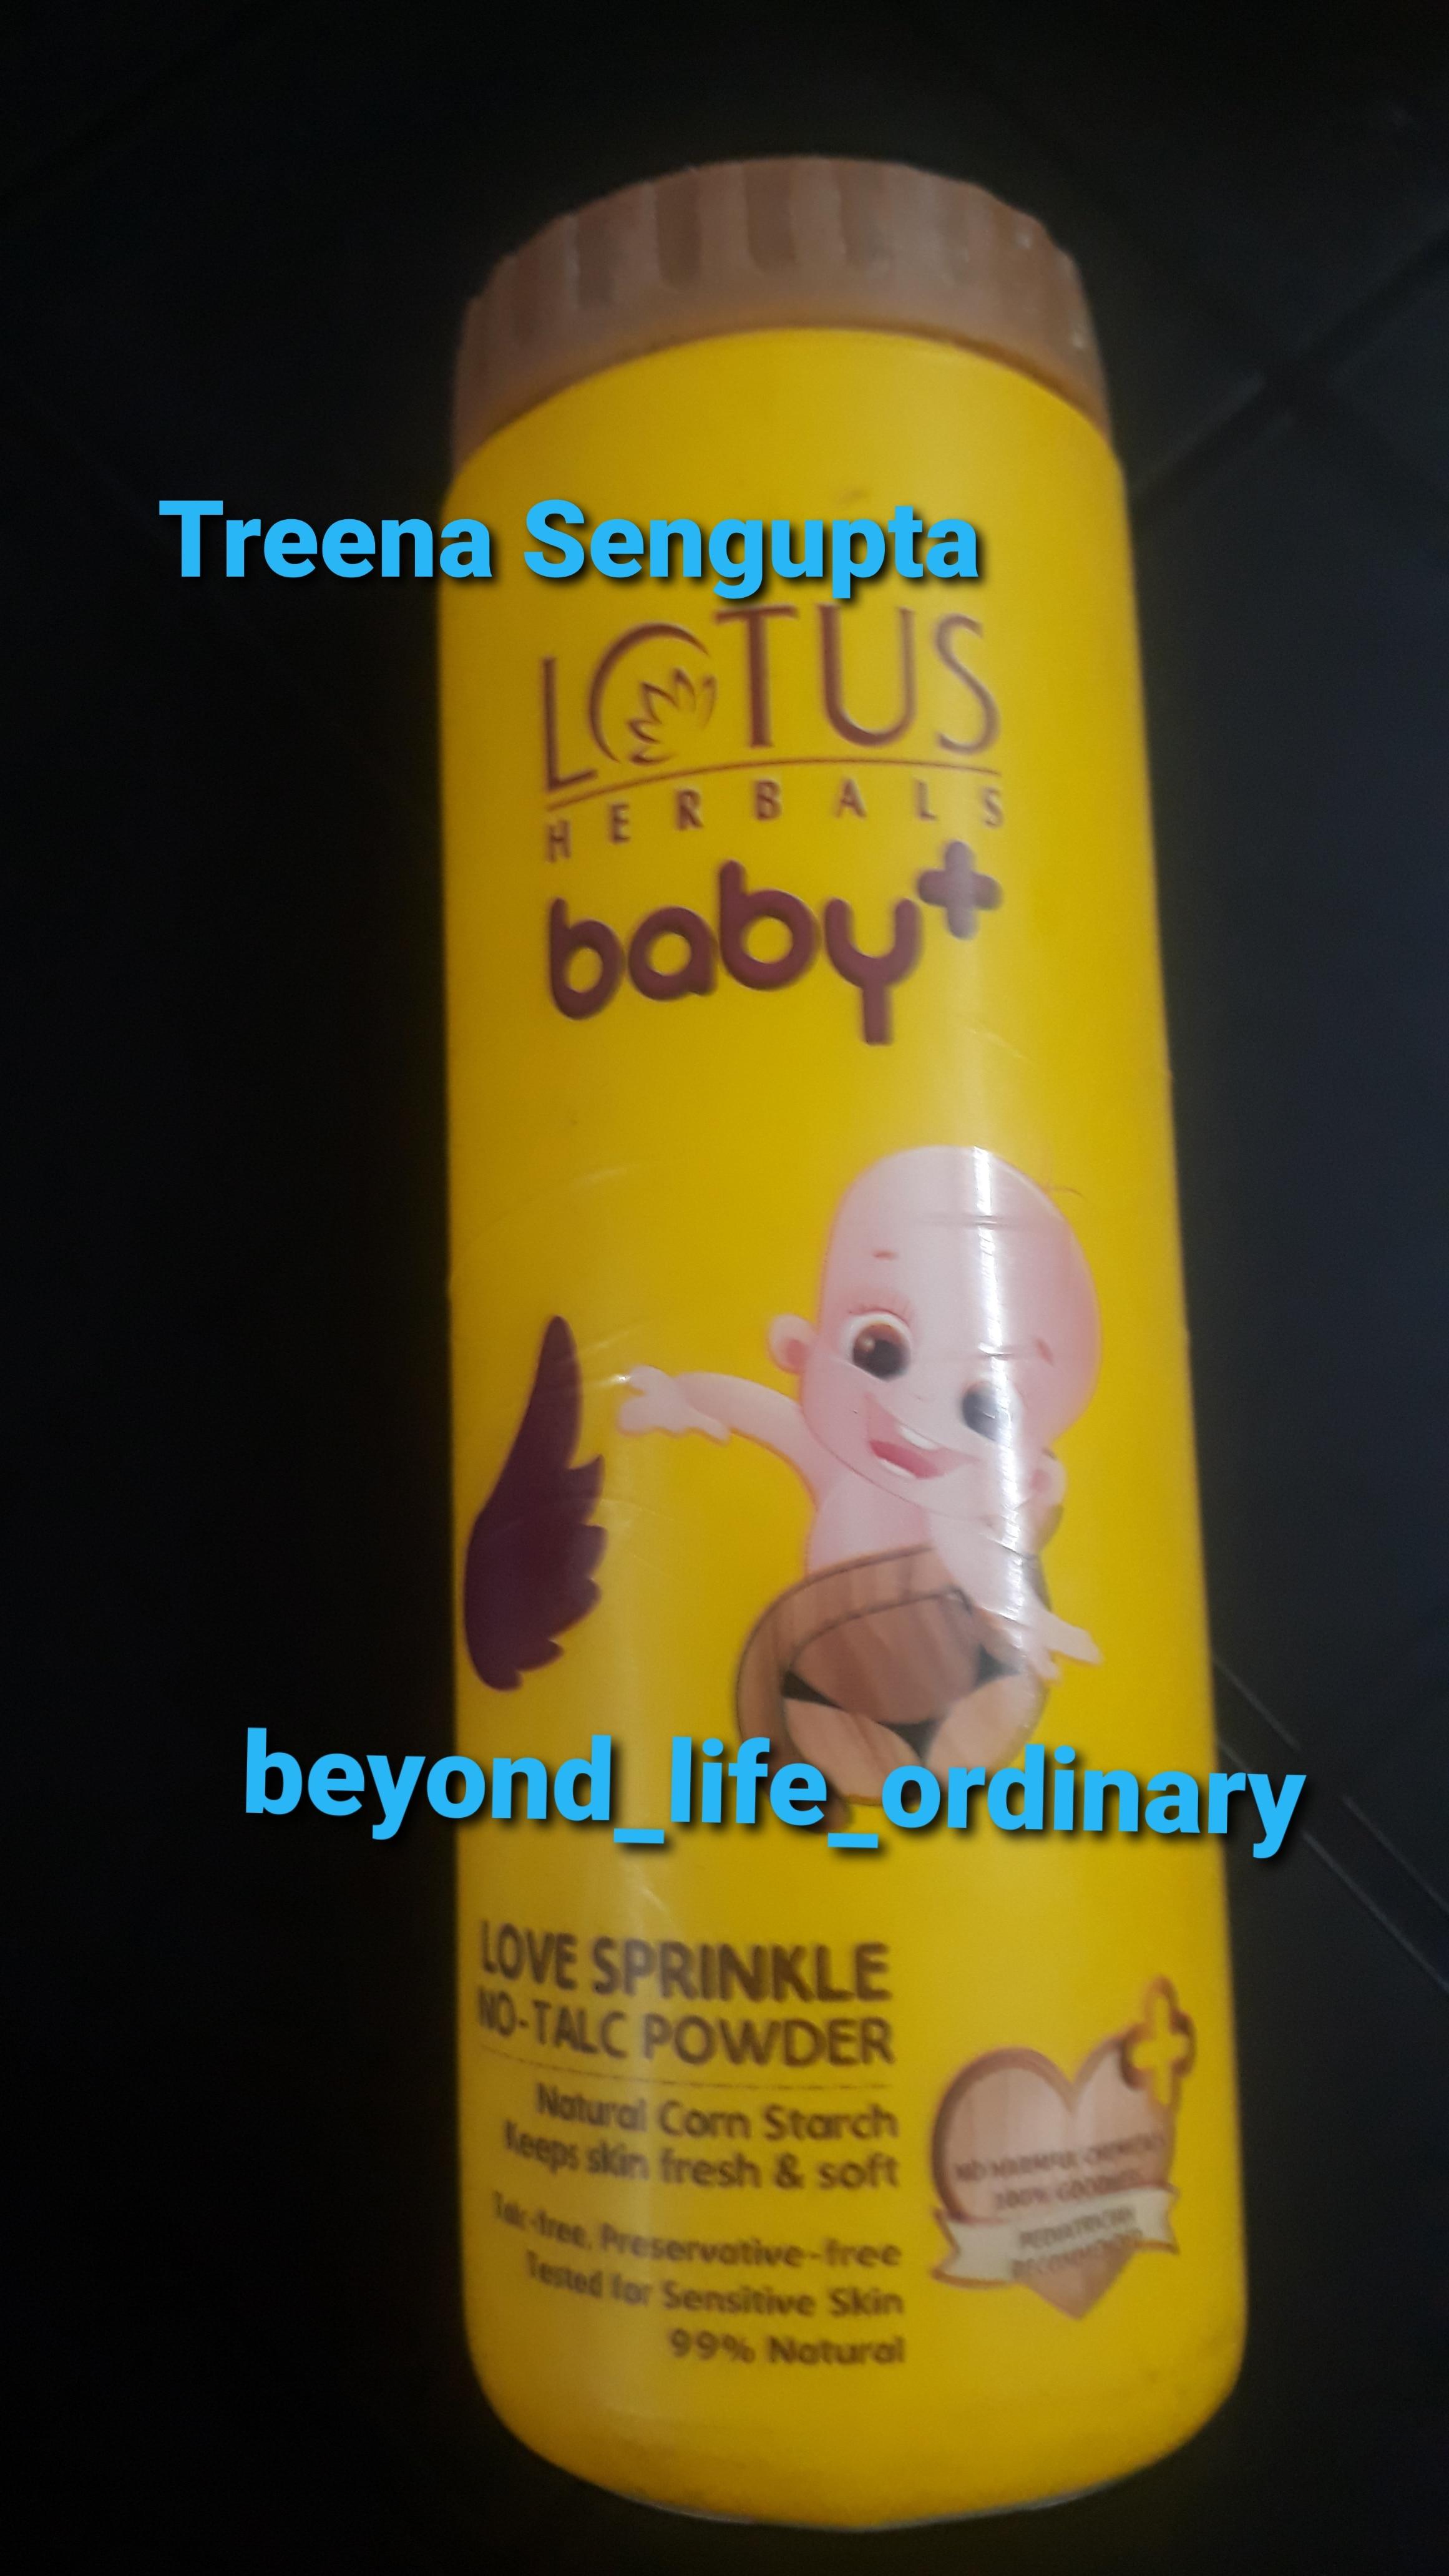 Lotus Herbals Baby+ Love Sprinkle No-Talc Powder-A must buy product-By treena123